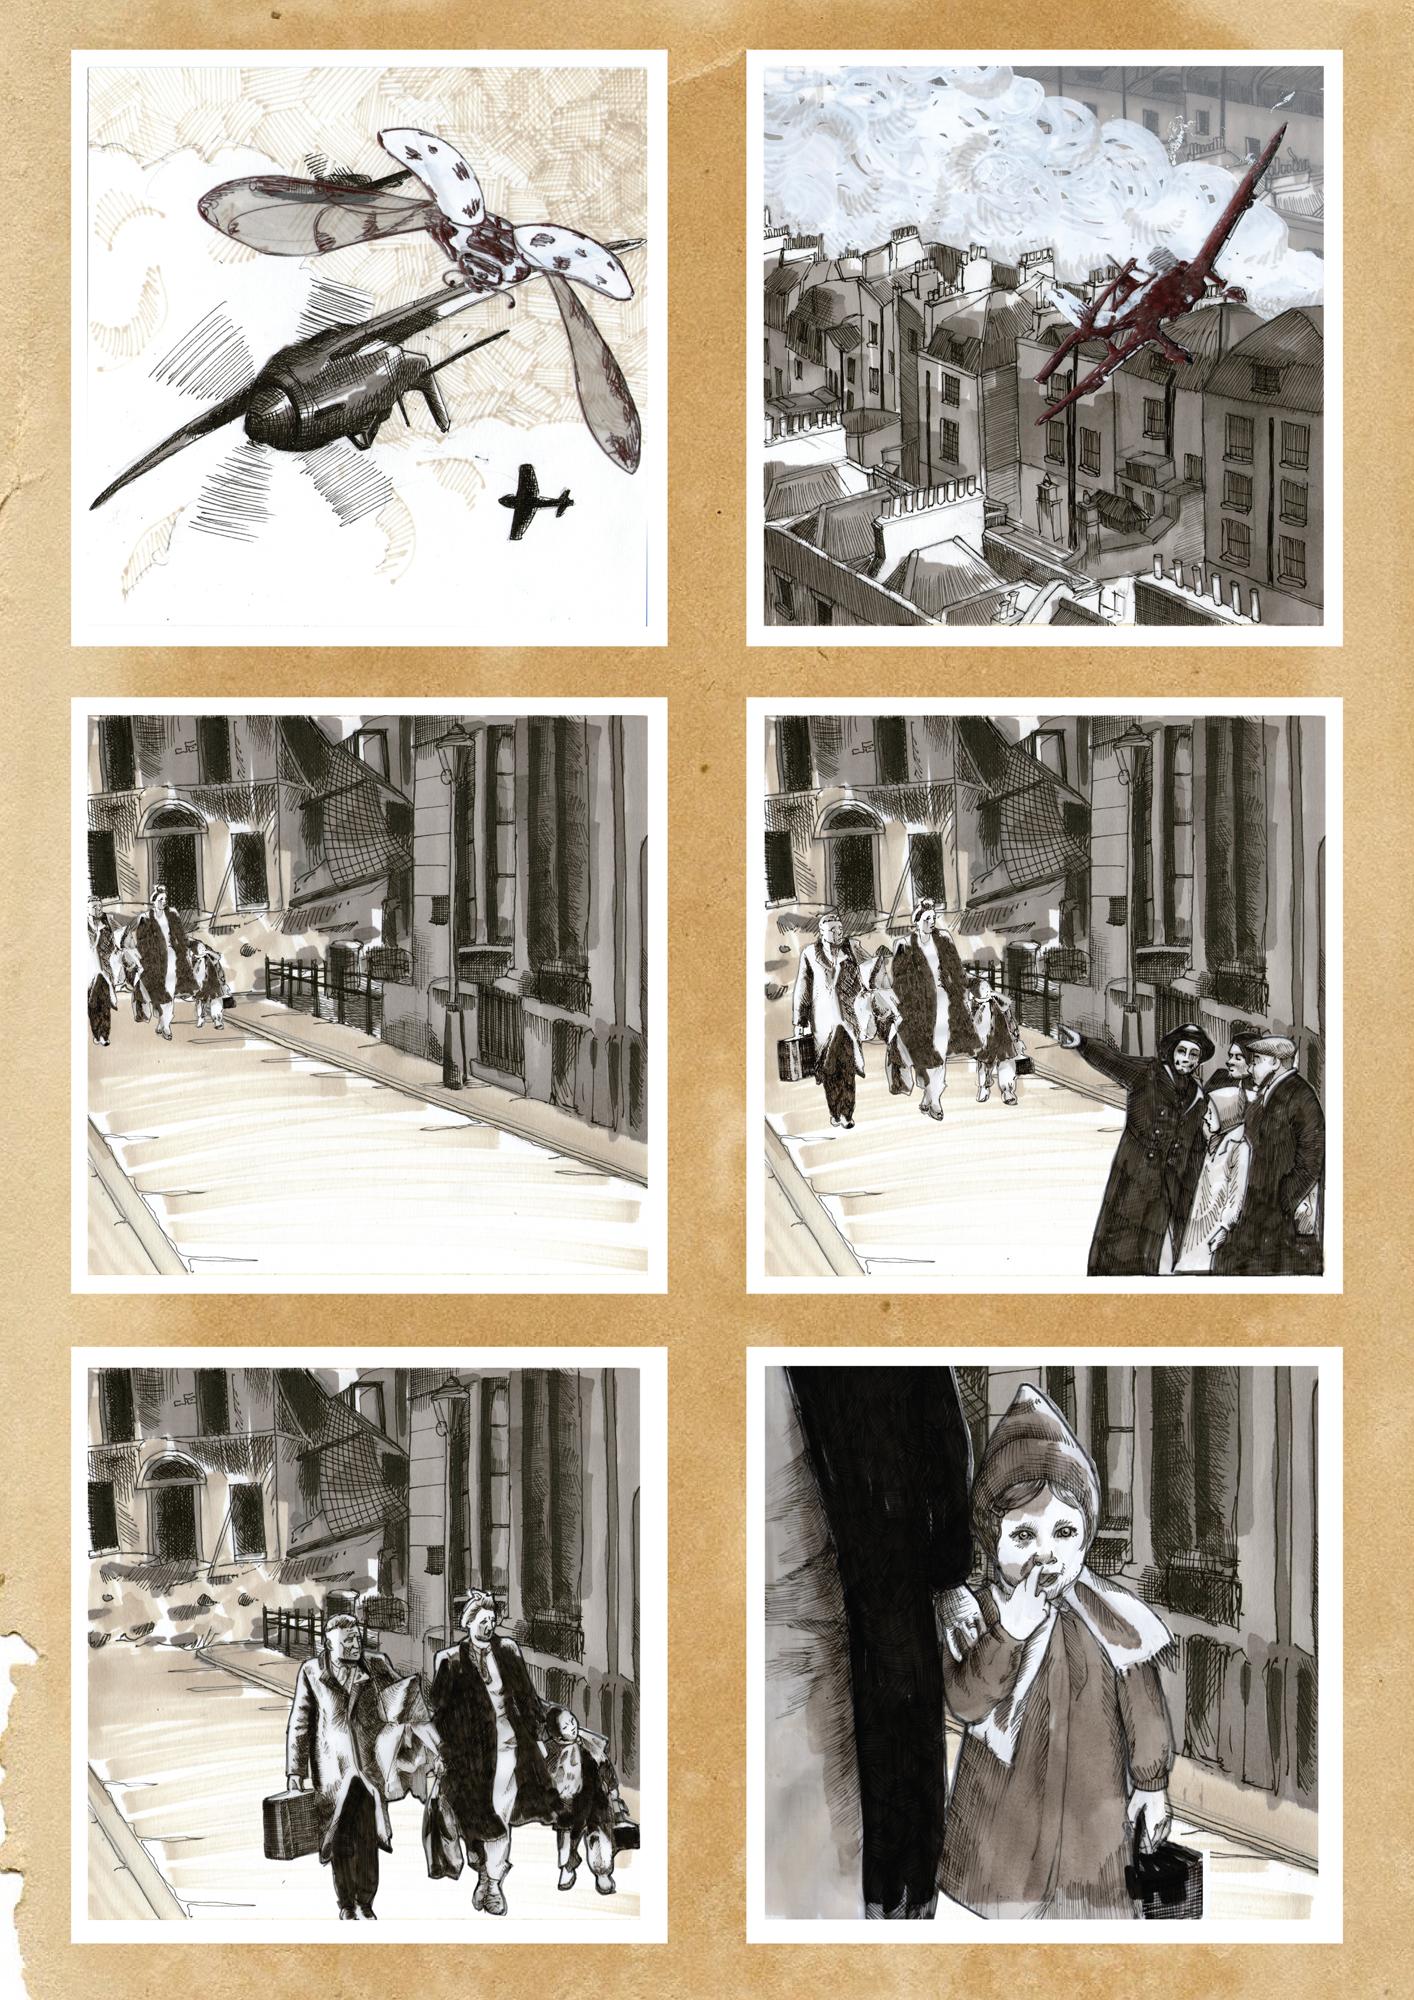 6 Panel Comic